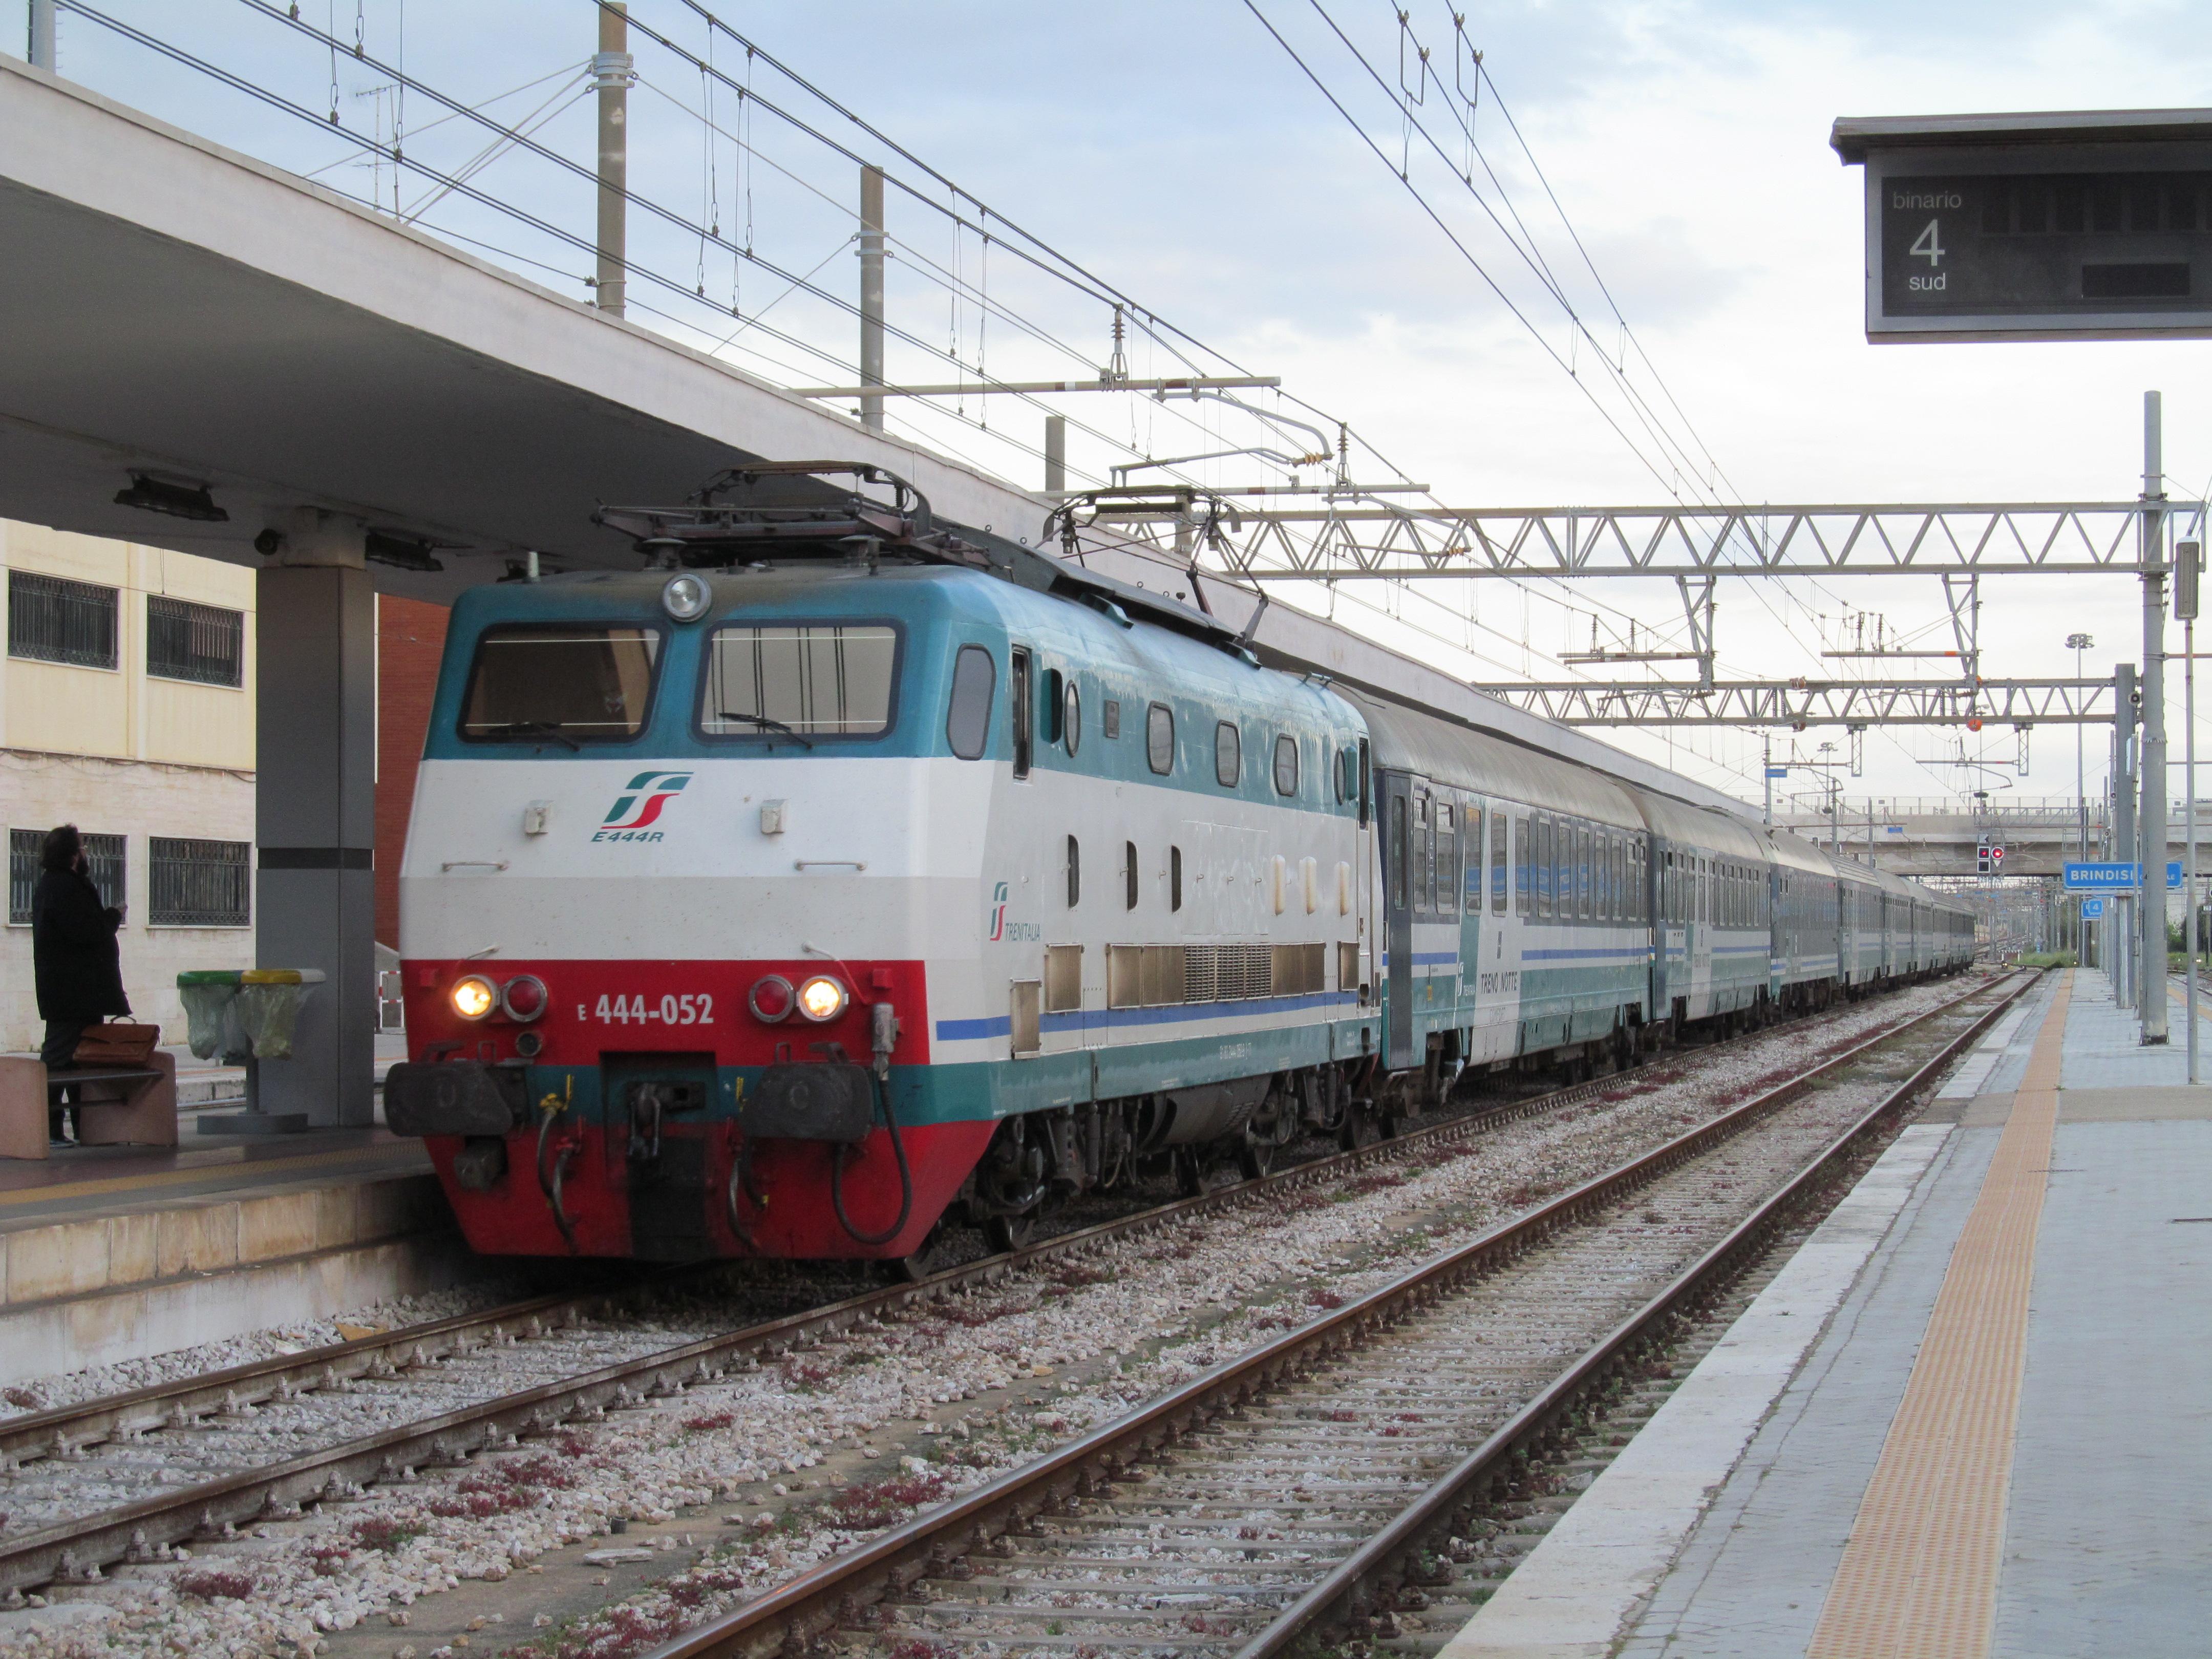 Eurostar Villa San Giovanni Roma Trenitalia